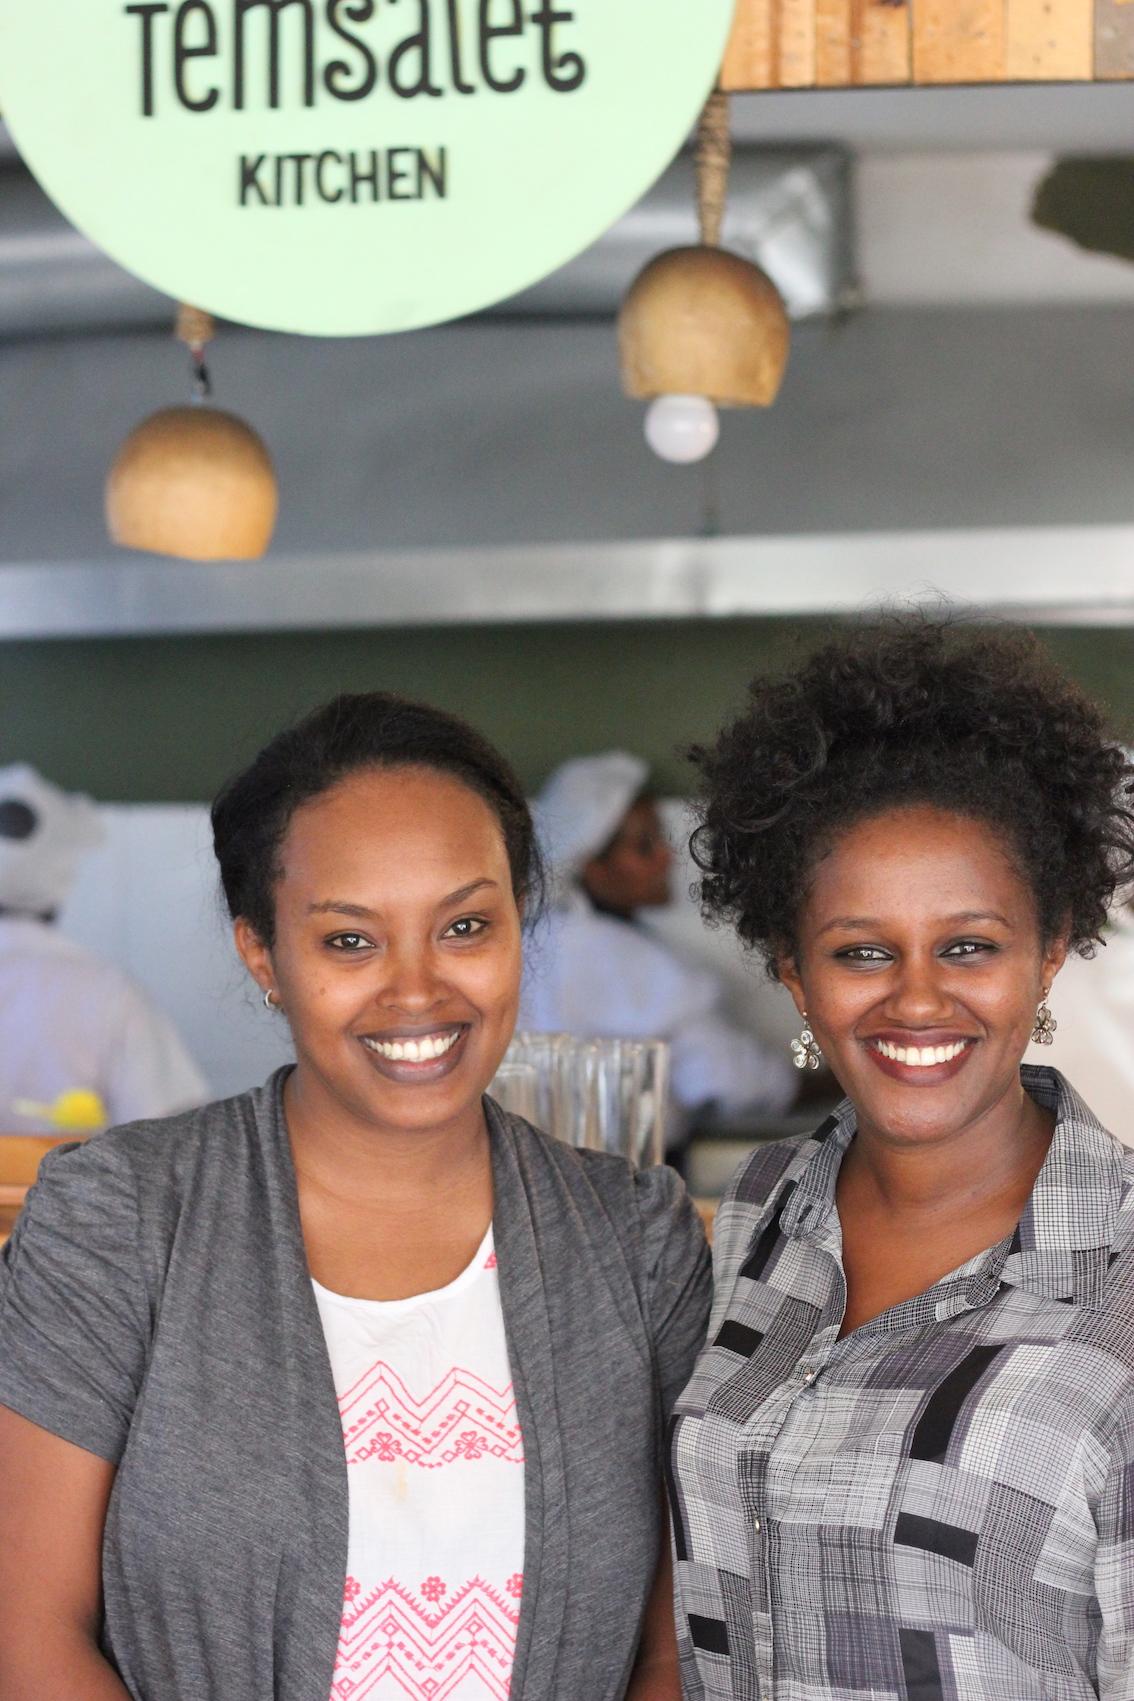 Temsalet Kitchen Ethiopian social enterprise